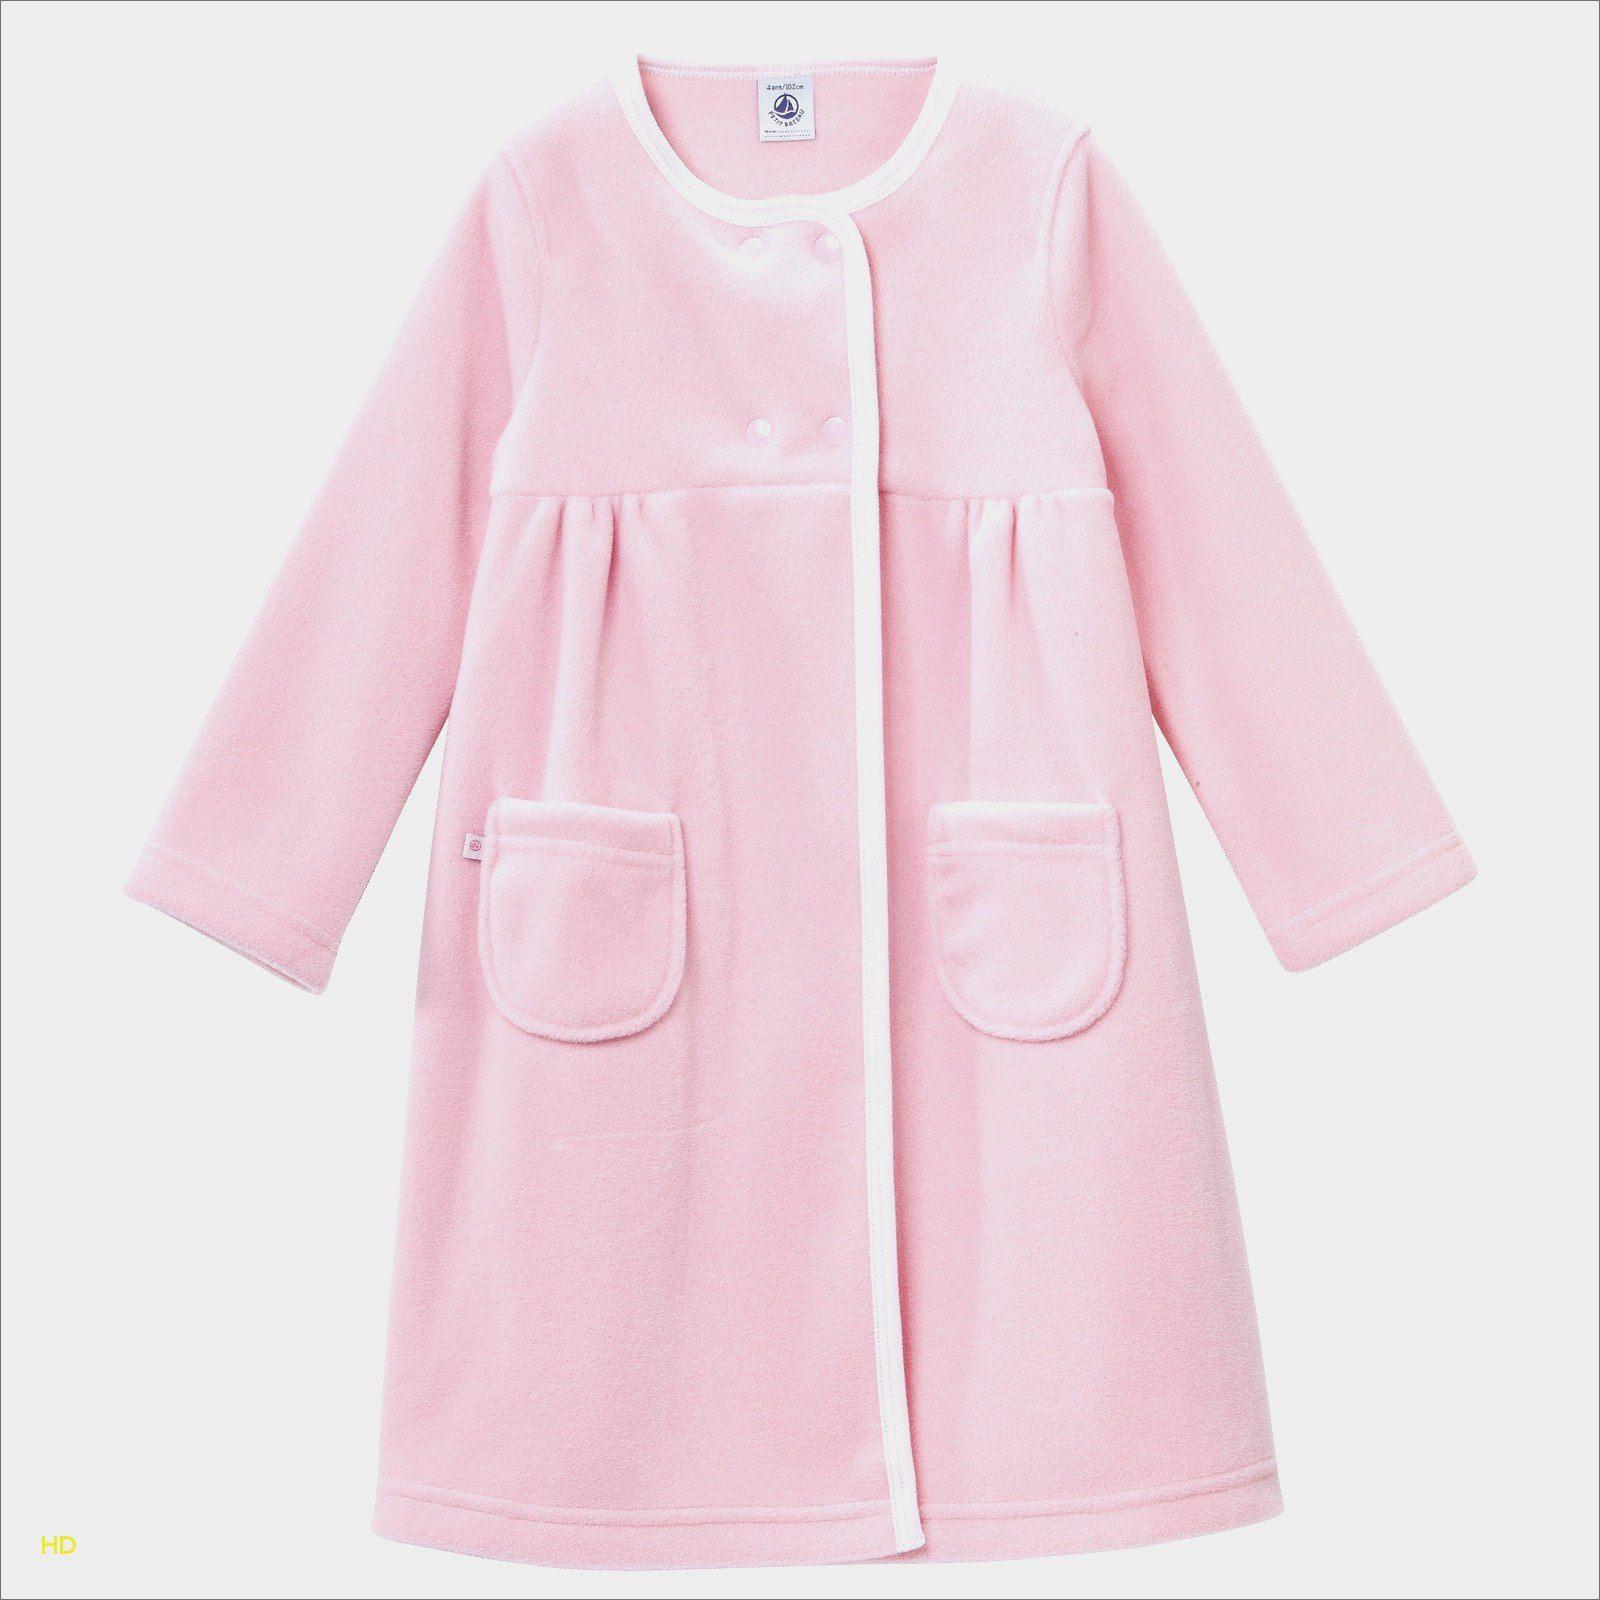 Lit Bebe Fille Agréable attrayant Robe Chambre Enfant Sur Robe De Chambre Ado Luxe Chambre